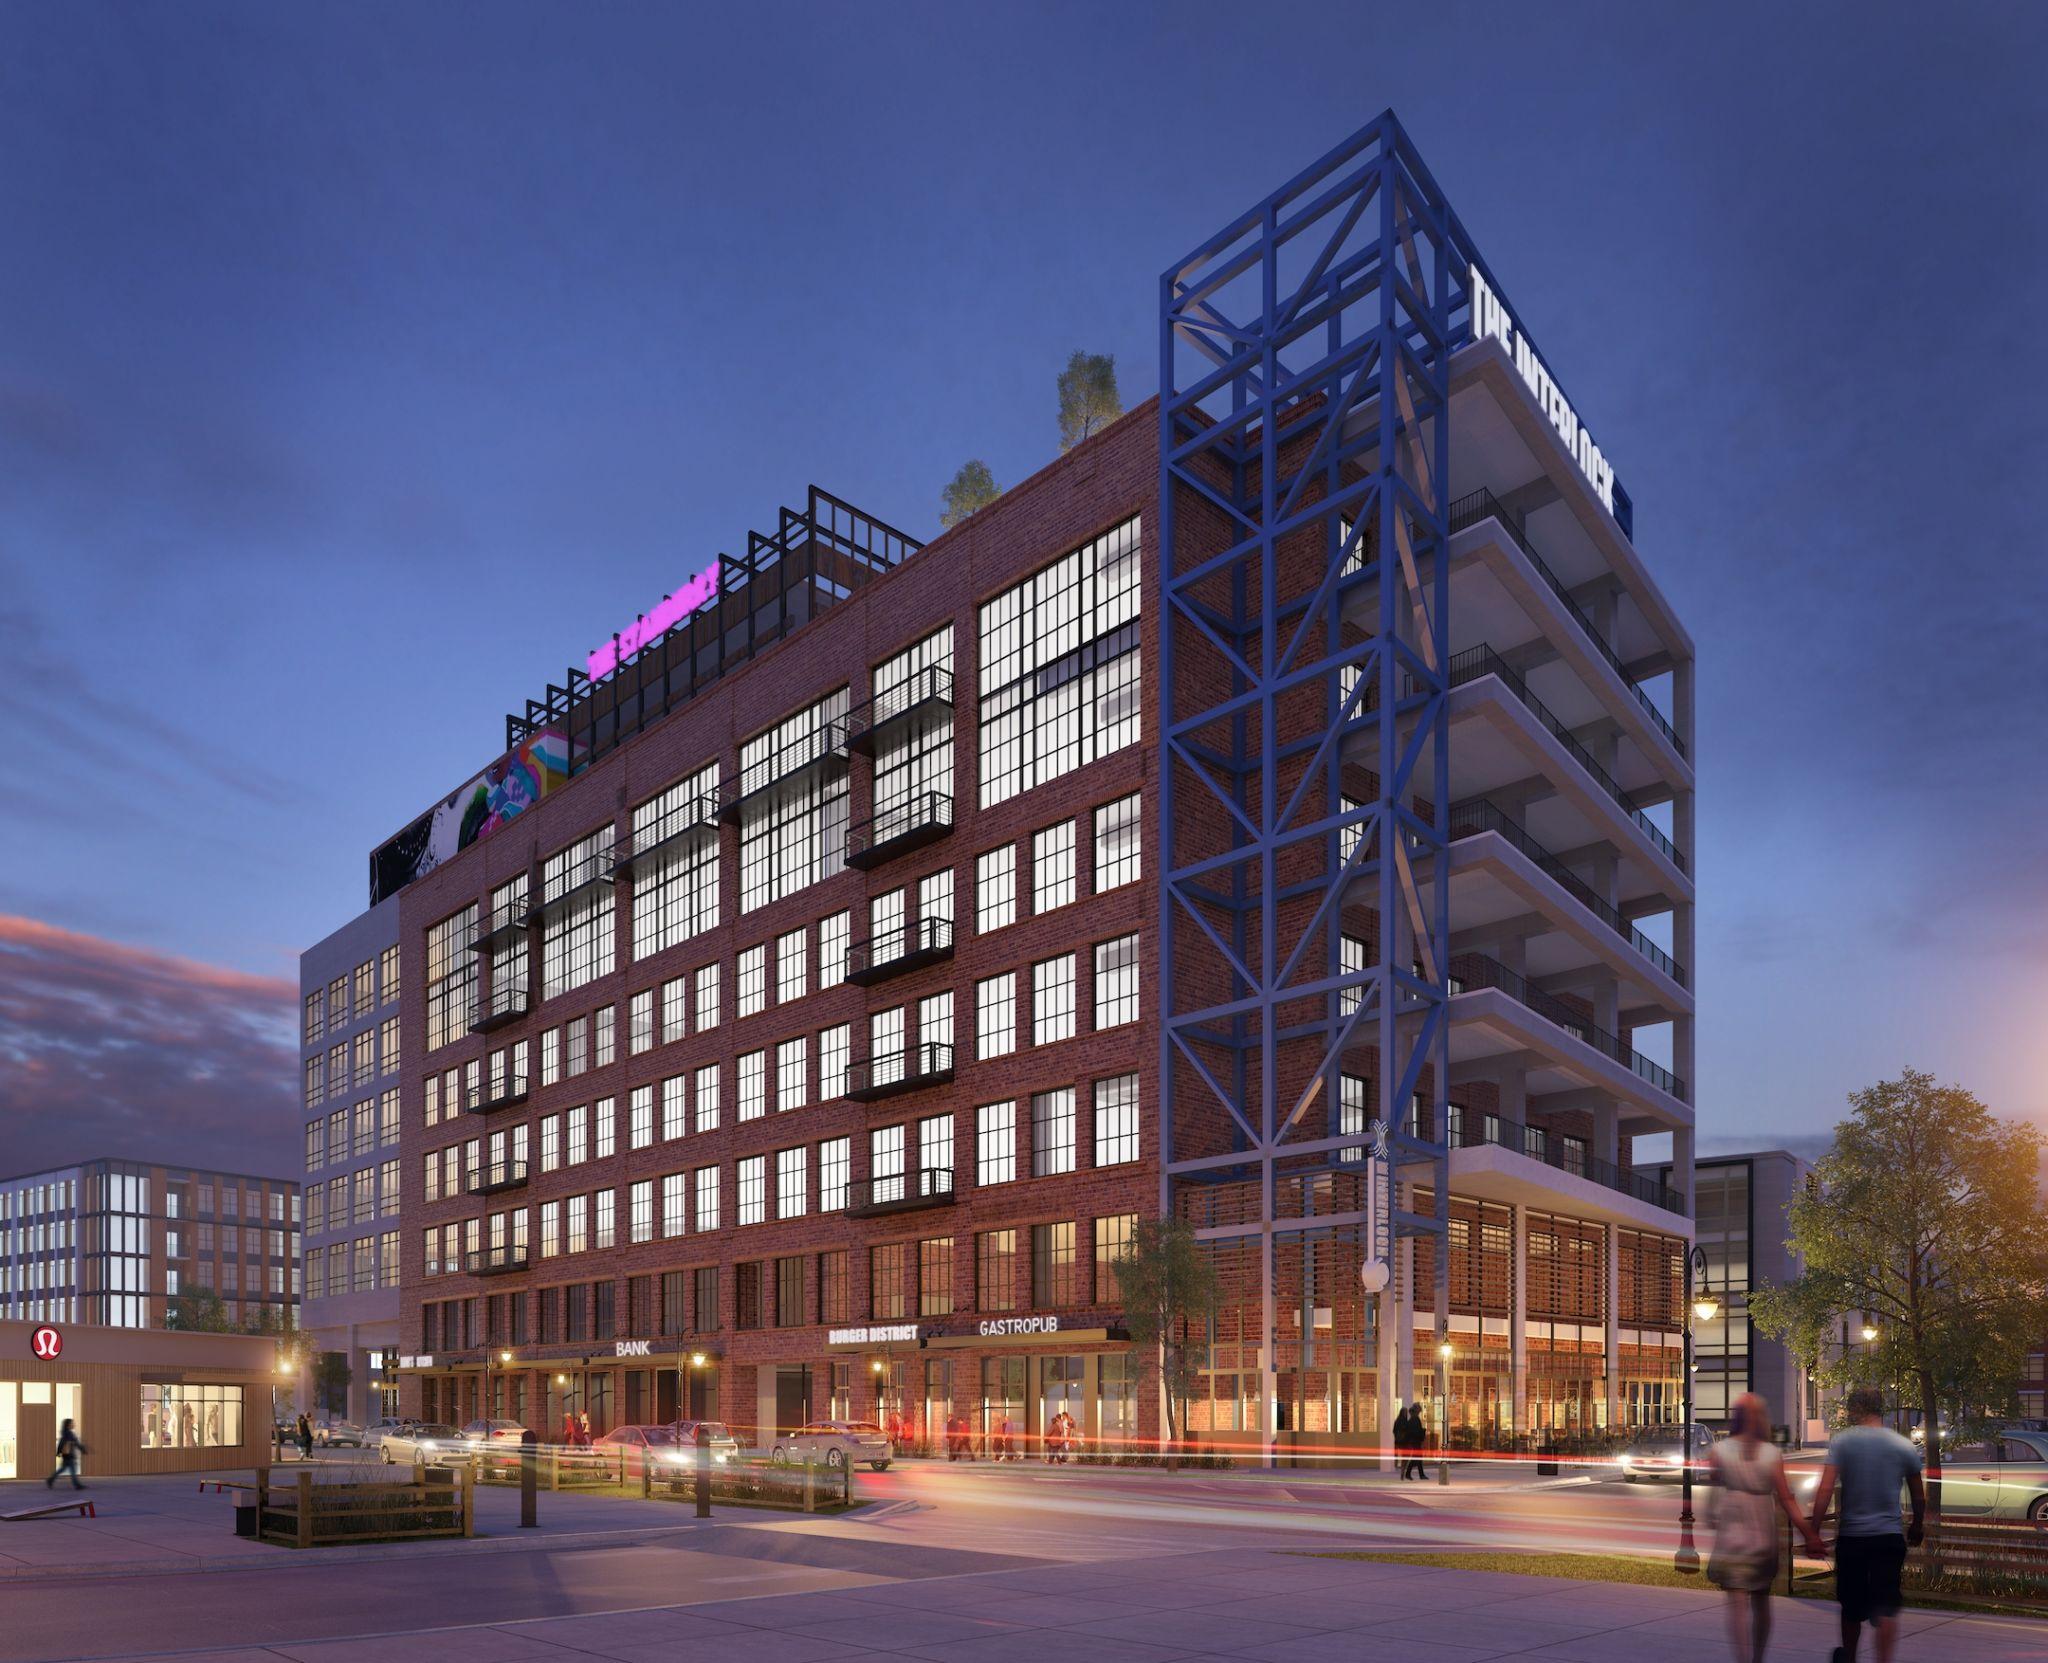 The Interlock - Apartments Rendering